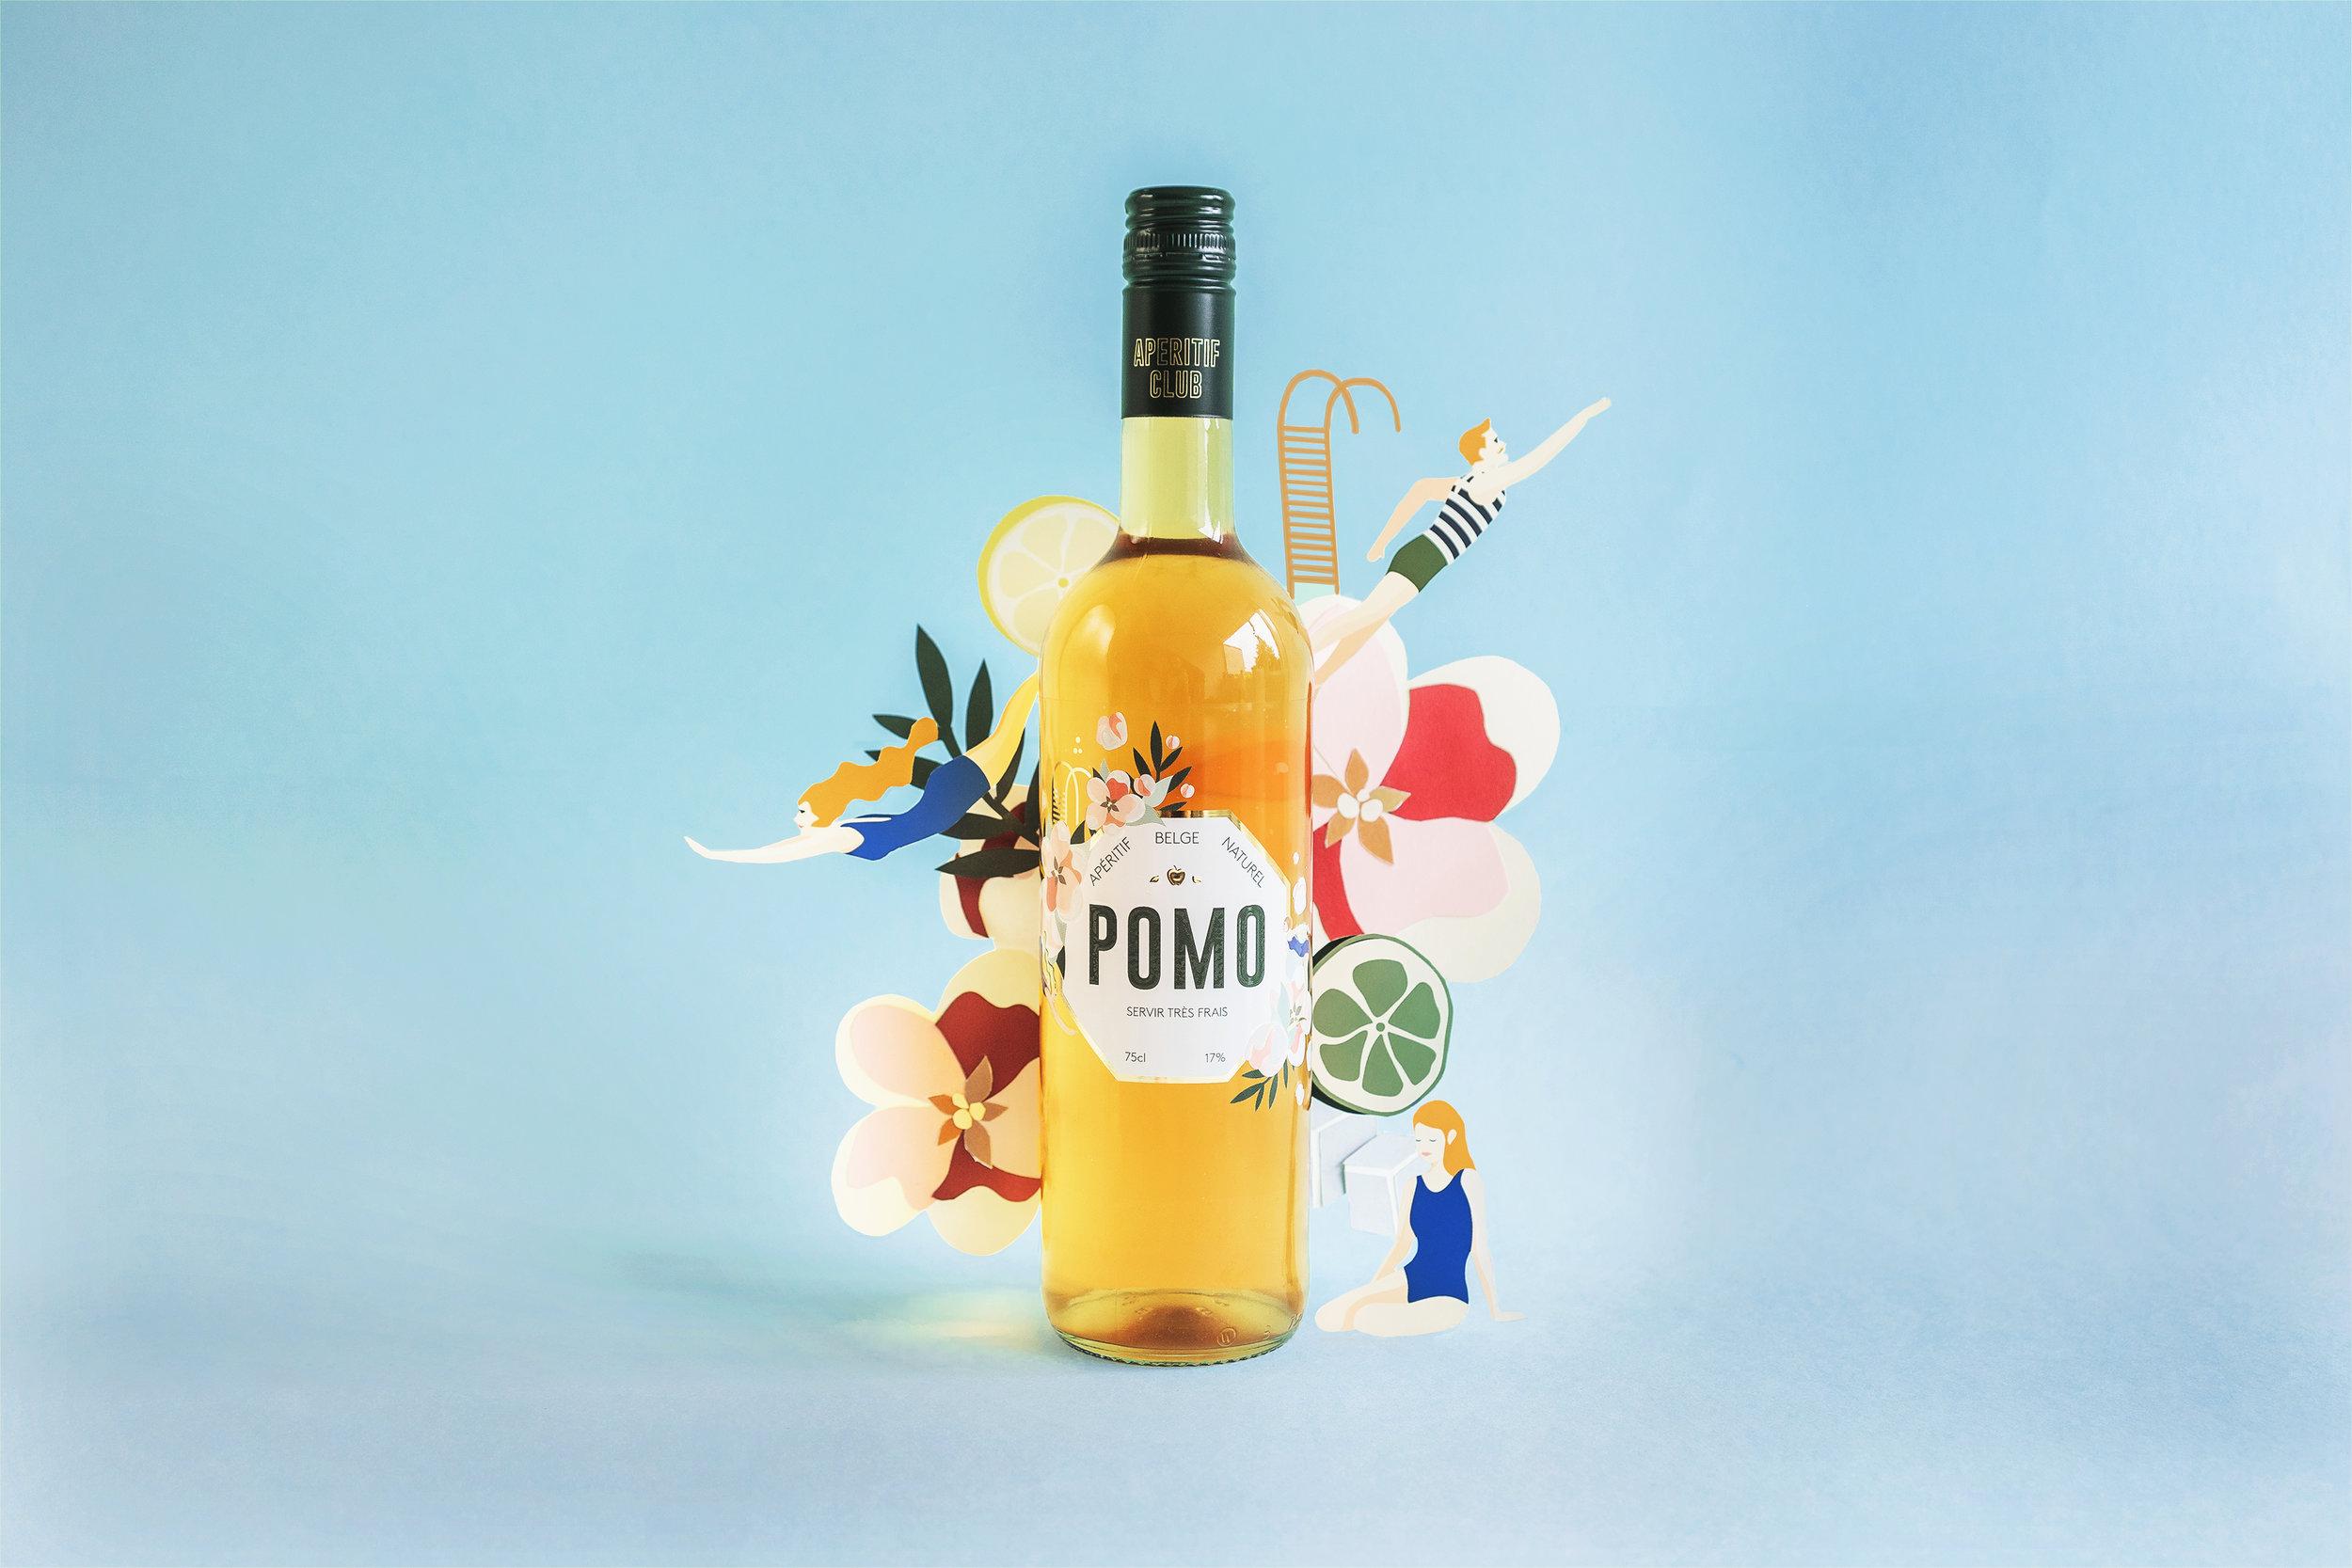 WEB3-Pomo-papier-decoupe-photo-bouteille.jpg